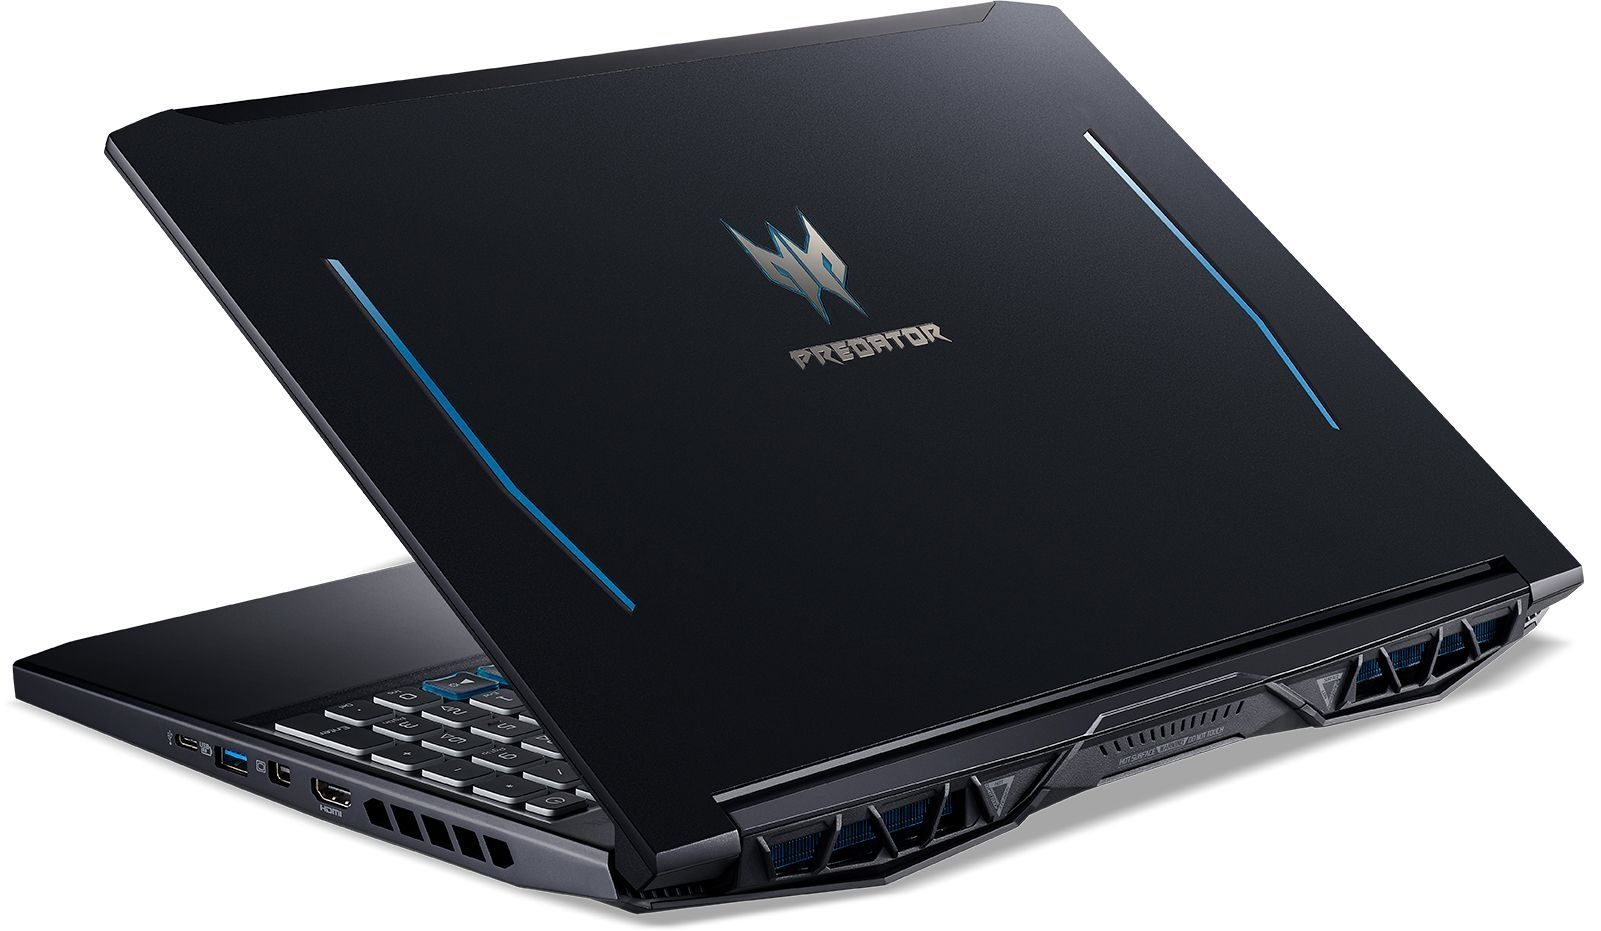 Гейминг лаптоп Acer Predator Helios 300 - PH317-53-72X3, 32GB, черен - 4